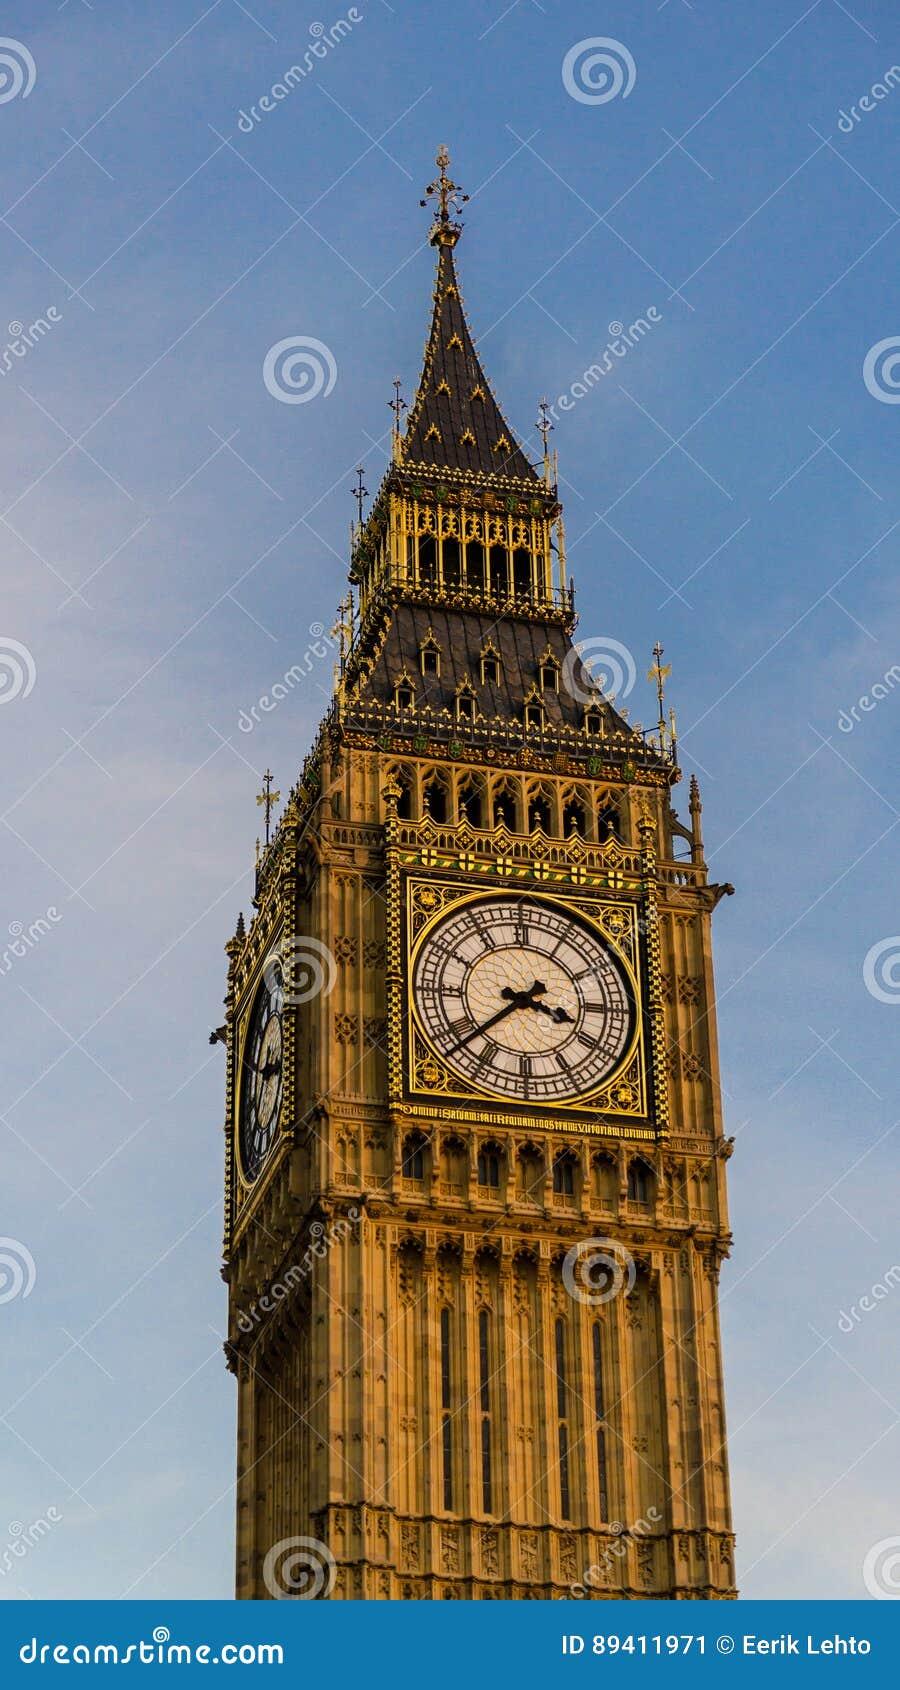 Ben grande, Londres, Reino Unido